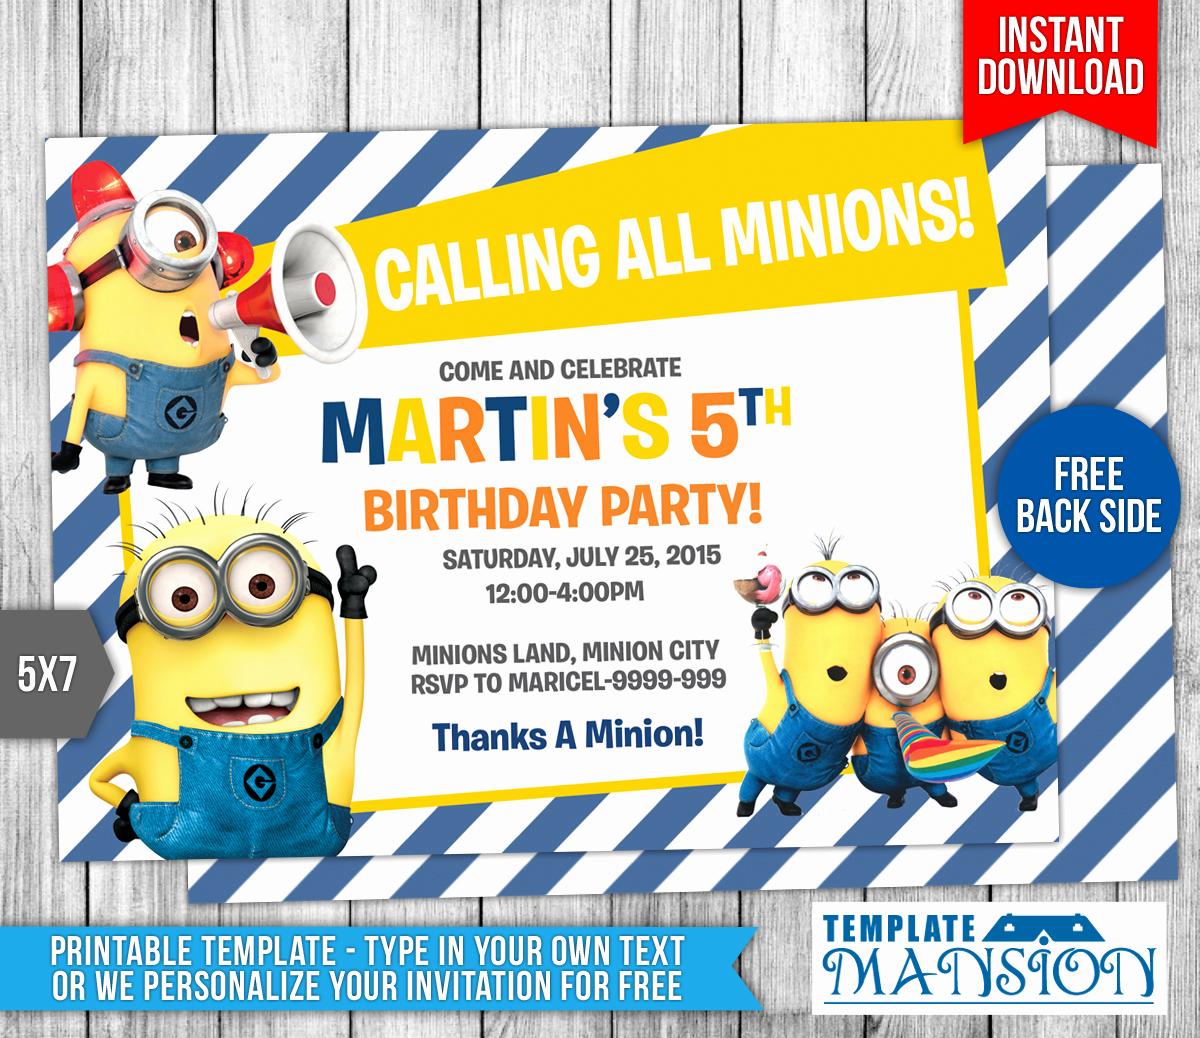 Minion Birthday Party Invitation Elegant Minions Birthday Invitation 7 by Templatemansion On